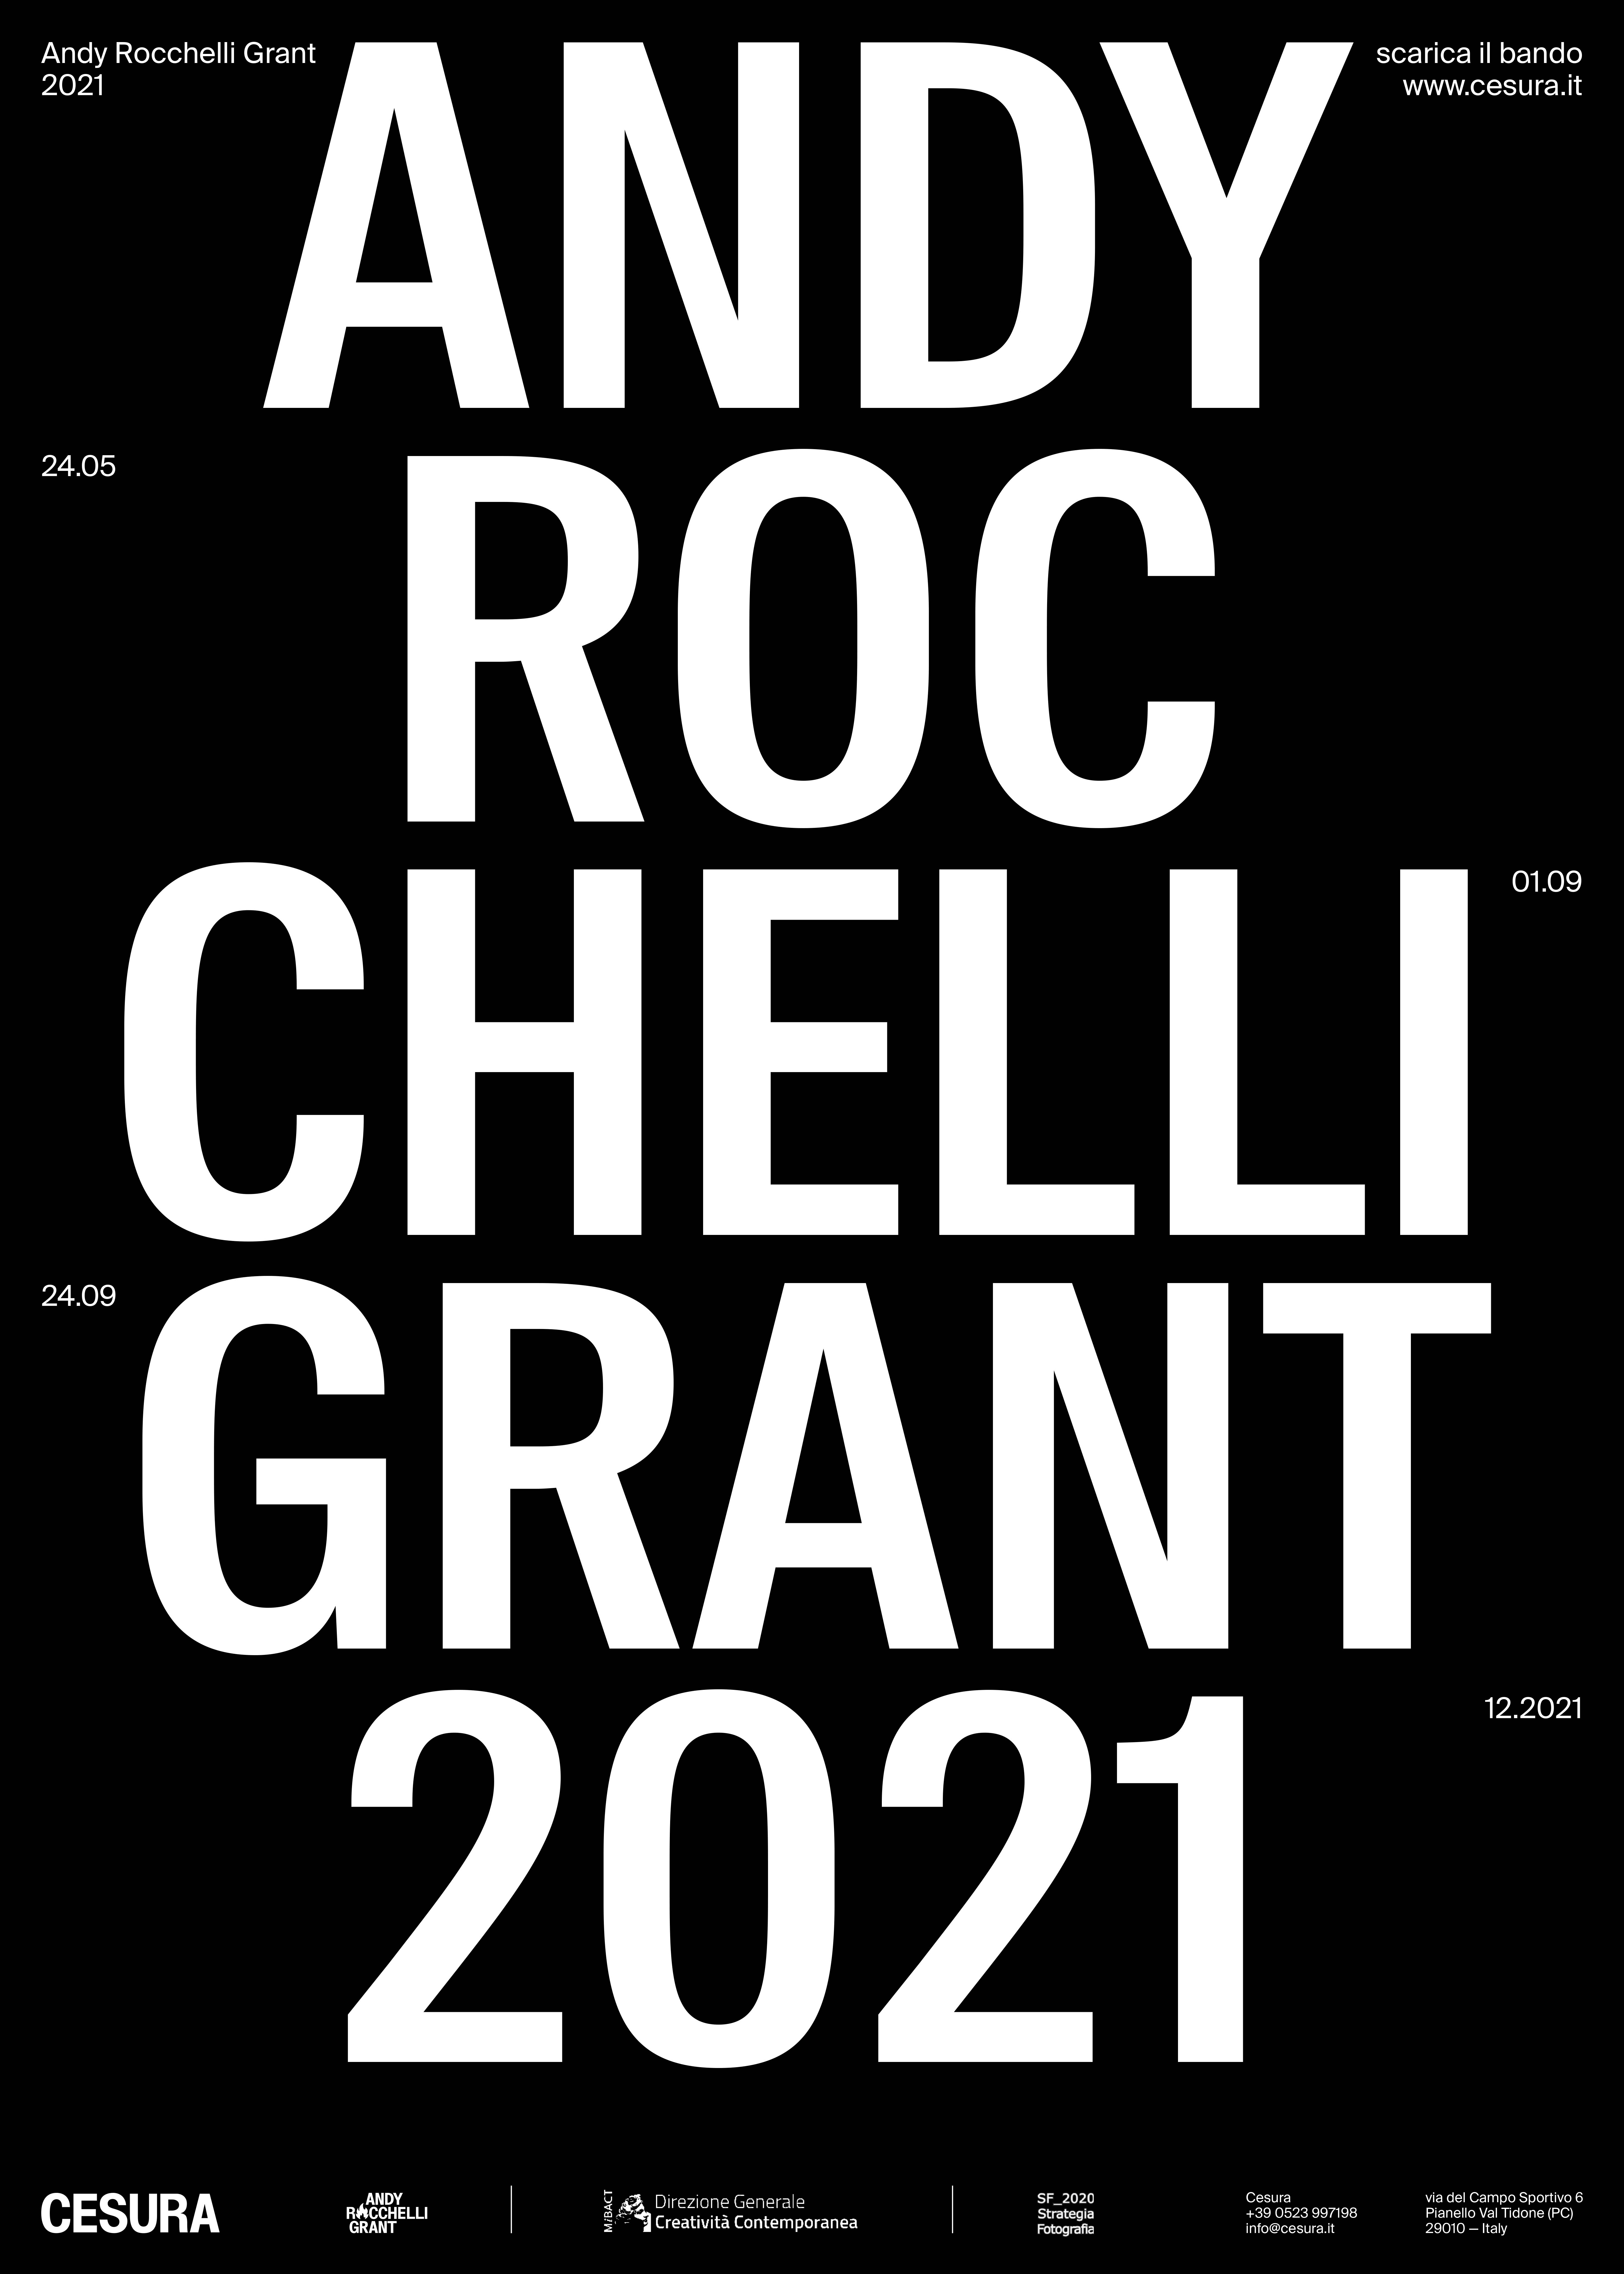 Andy Rocchelli Grant